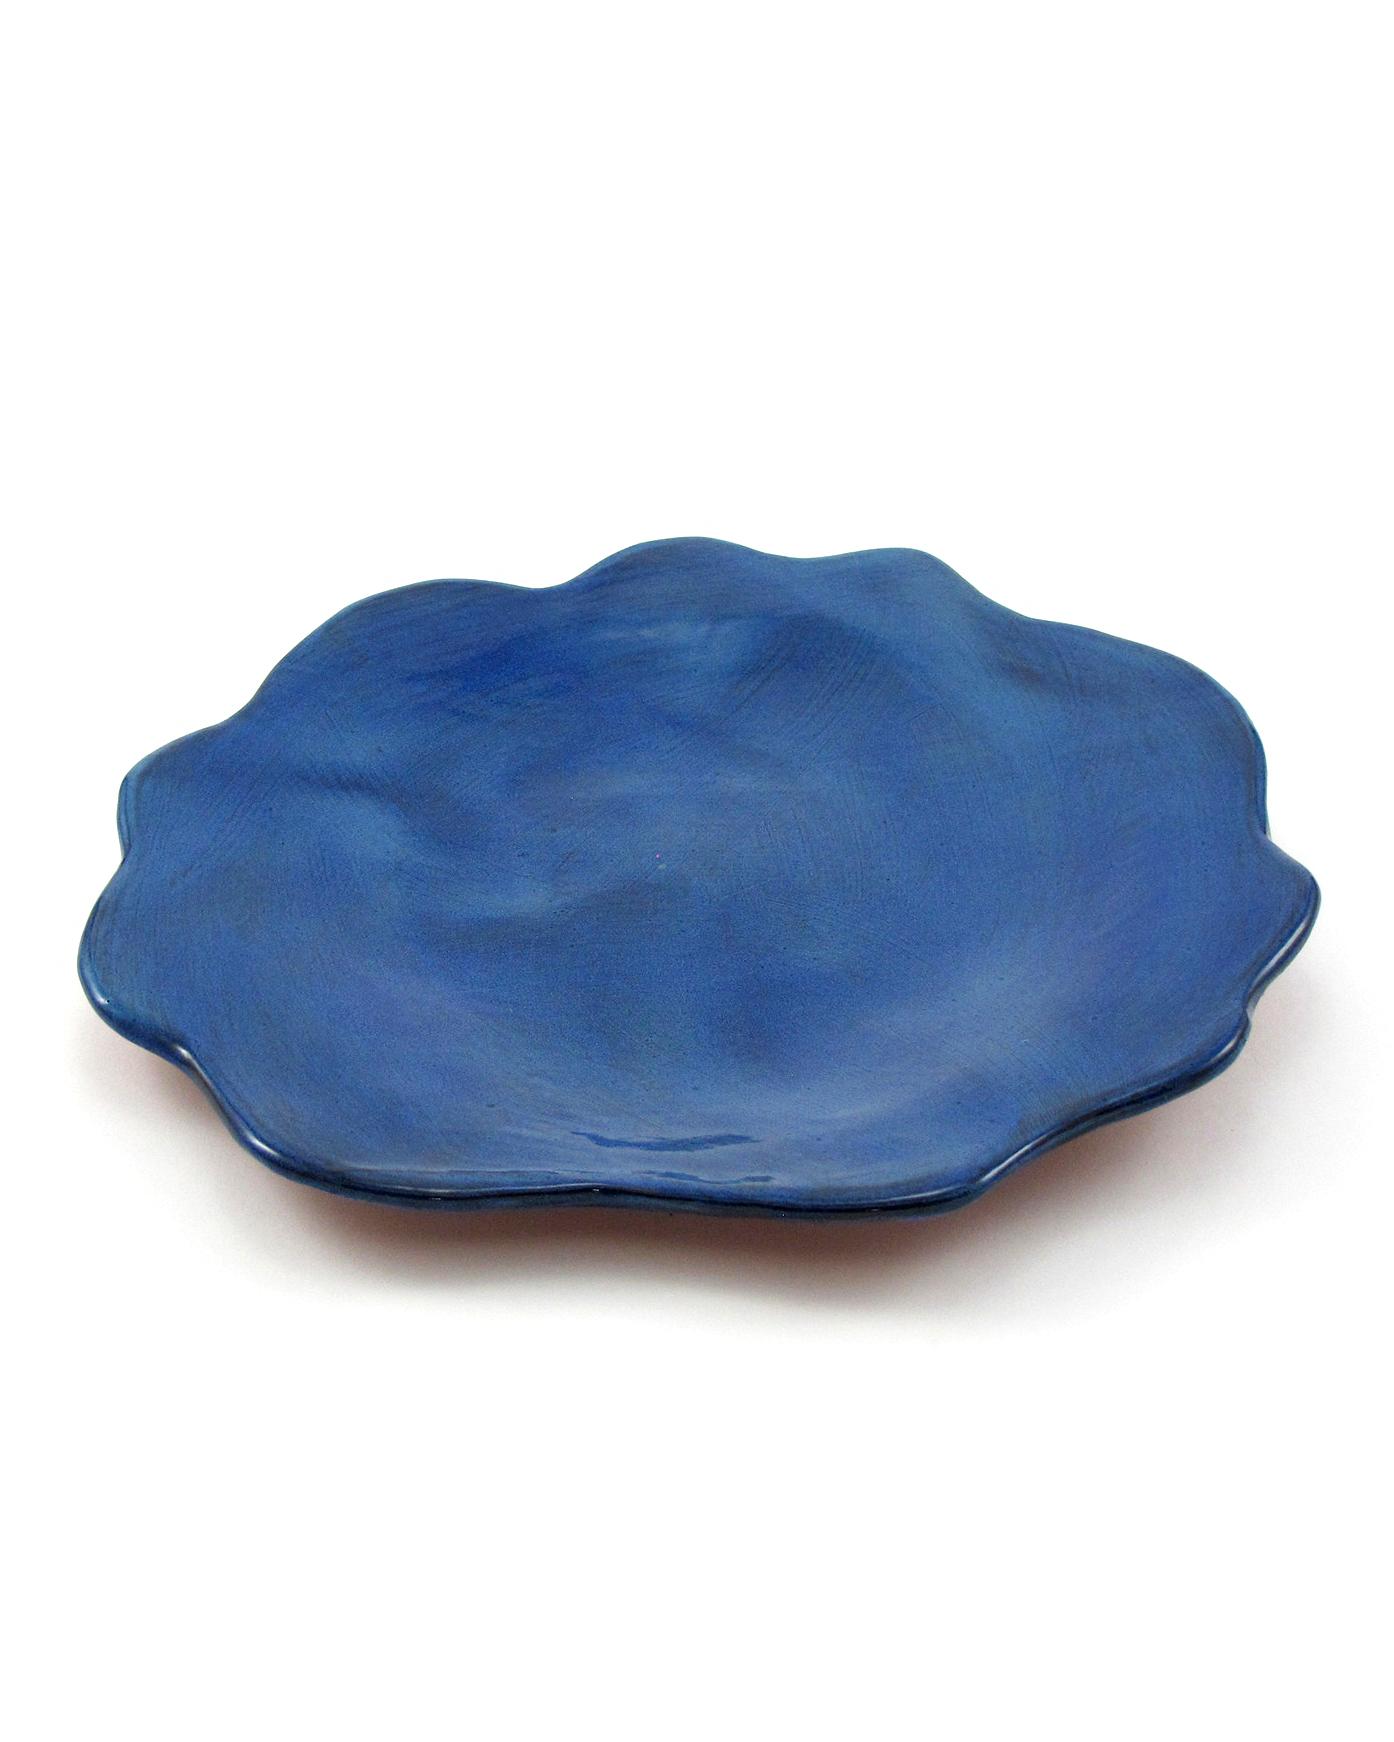 r. wood studio blueberry dinner plate